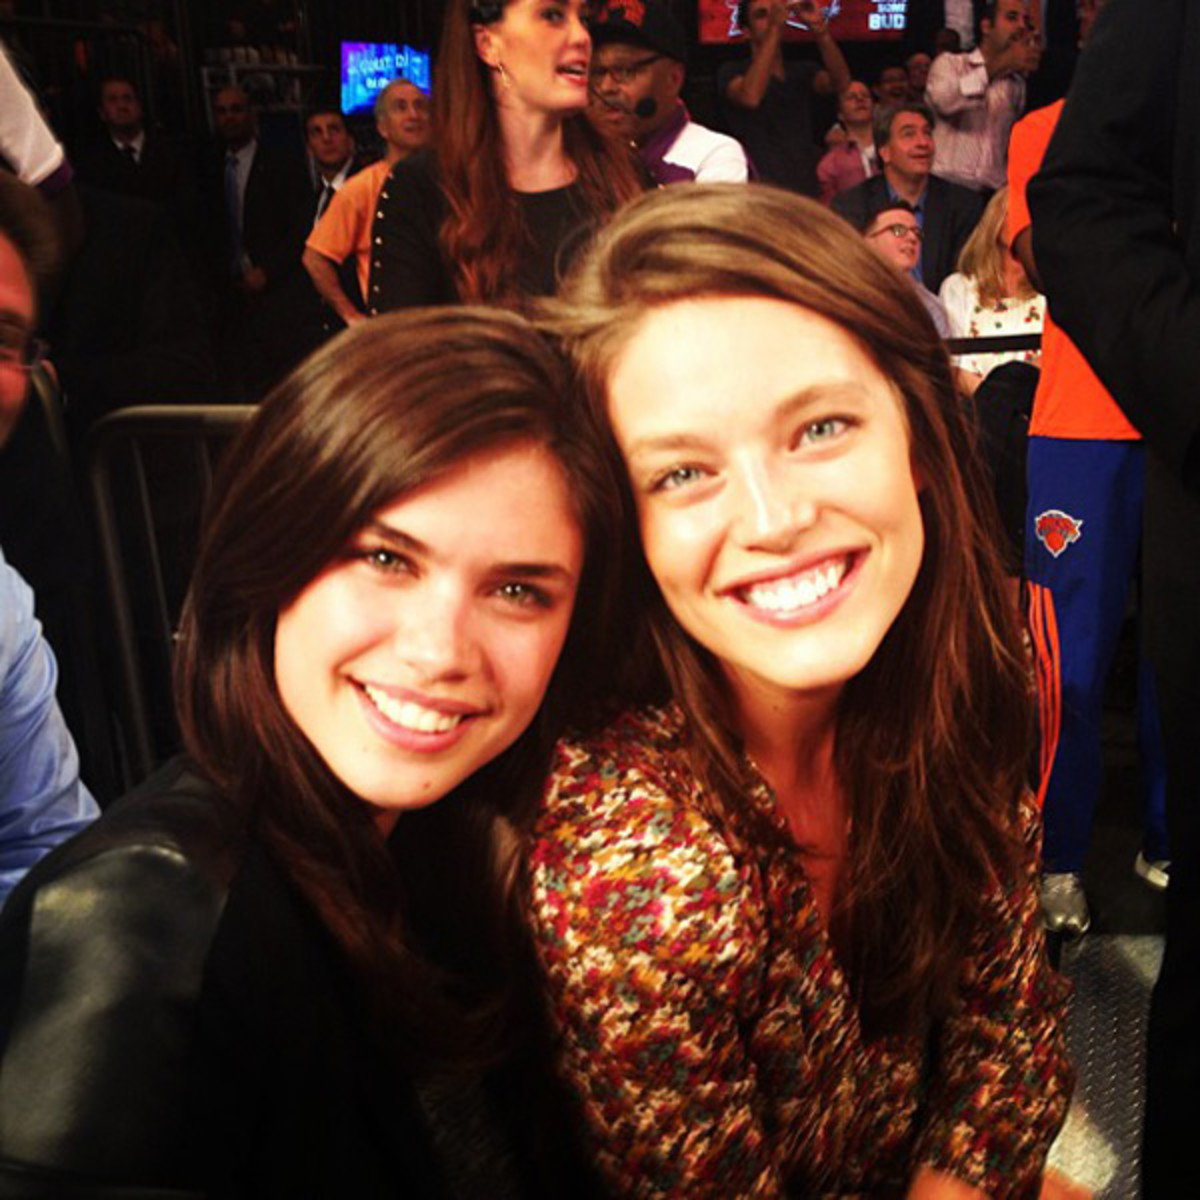 Emily DiDonato and Sara Sampaio :: @emilydidonato1